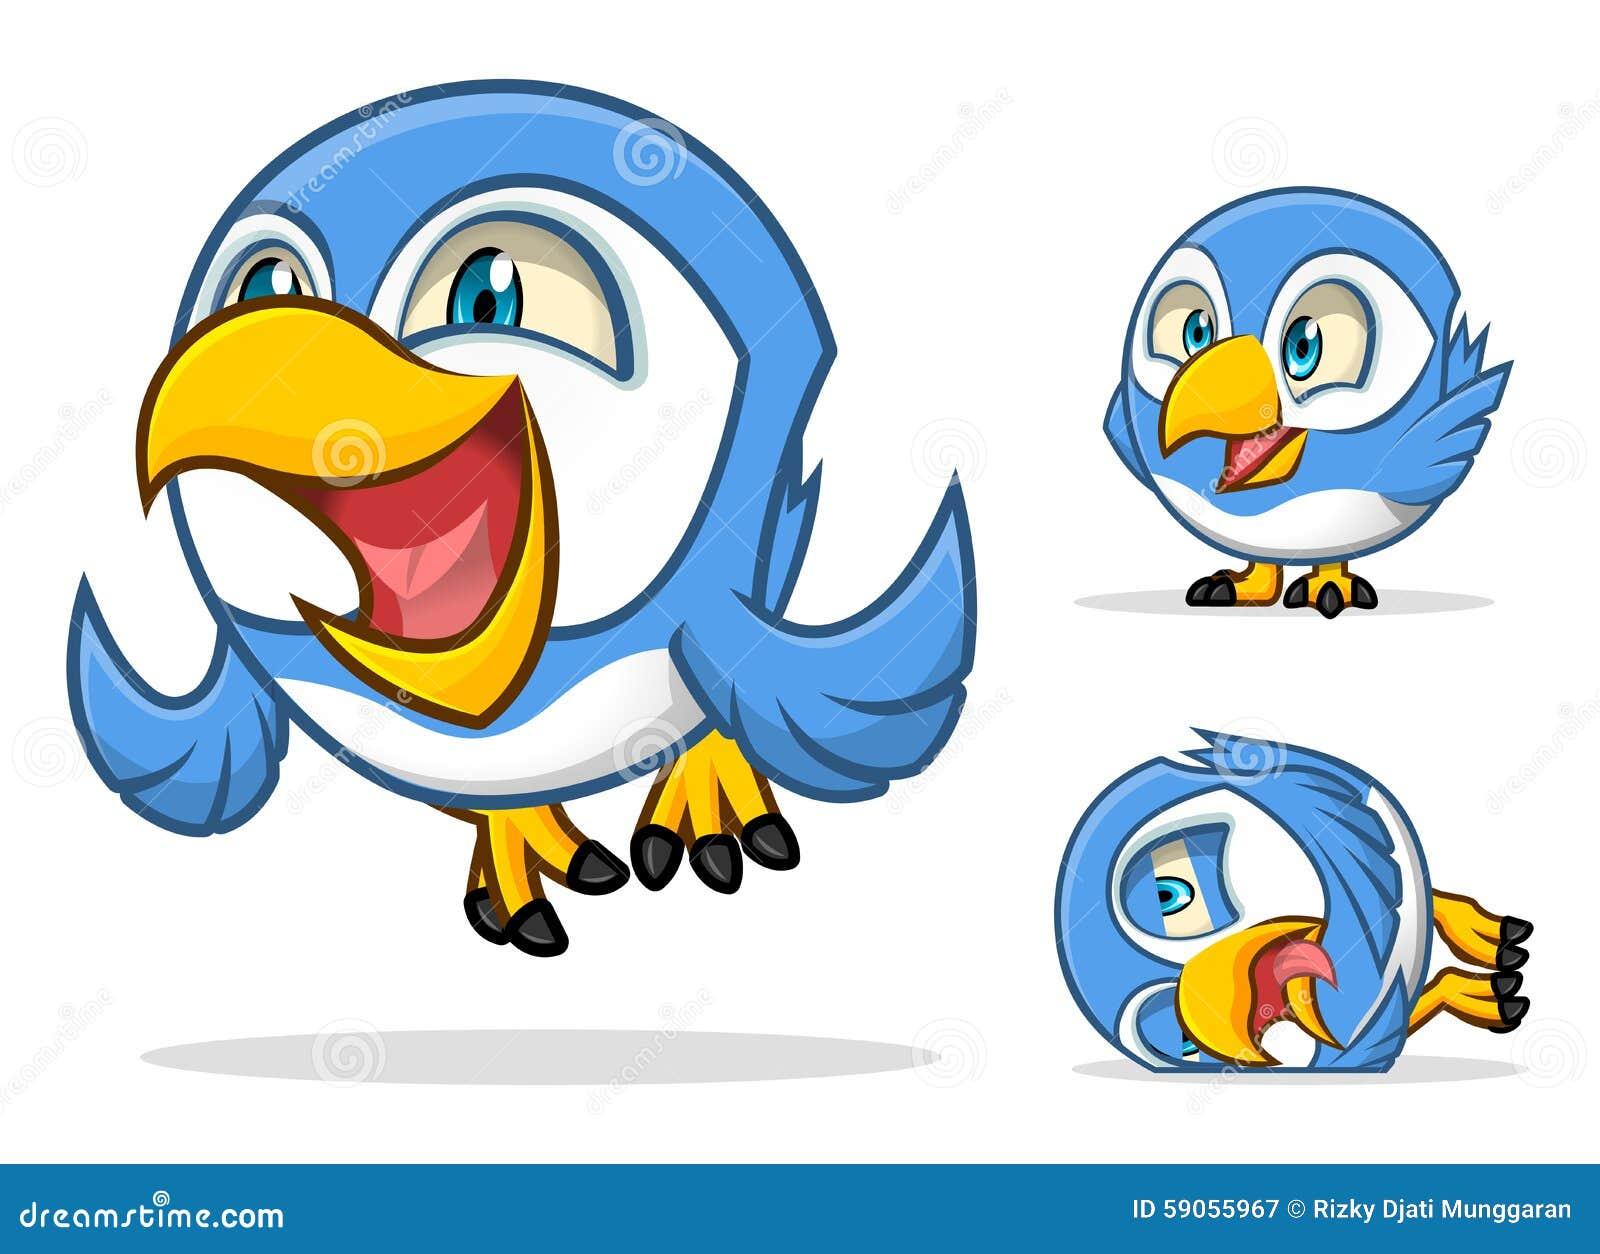 Funny Blue Bird Cartoon Character Illustration 59055967 Megapixl